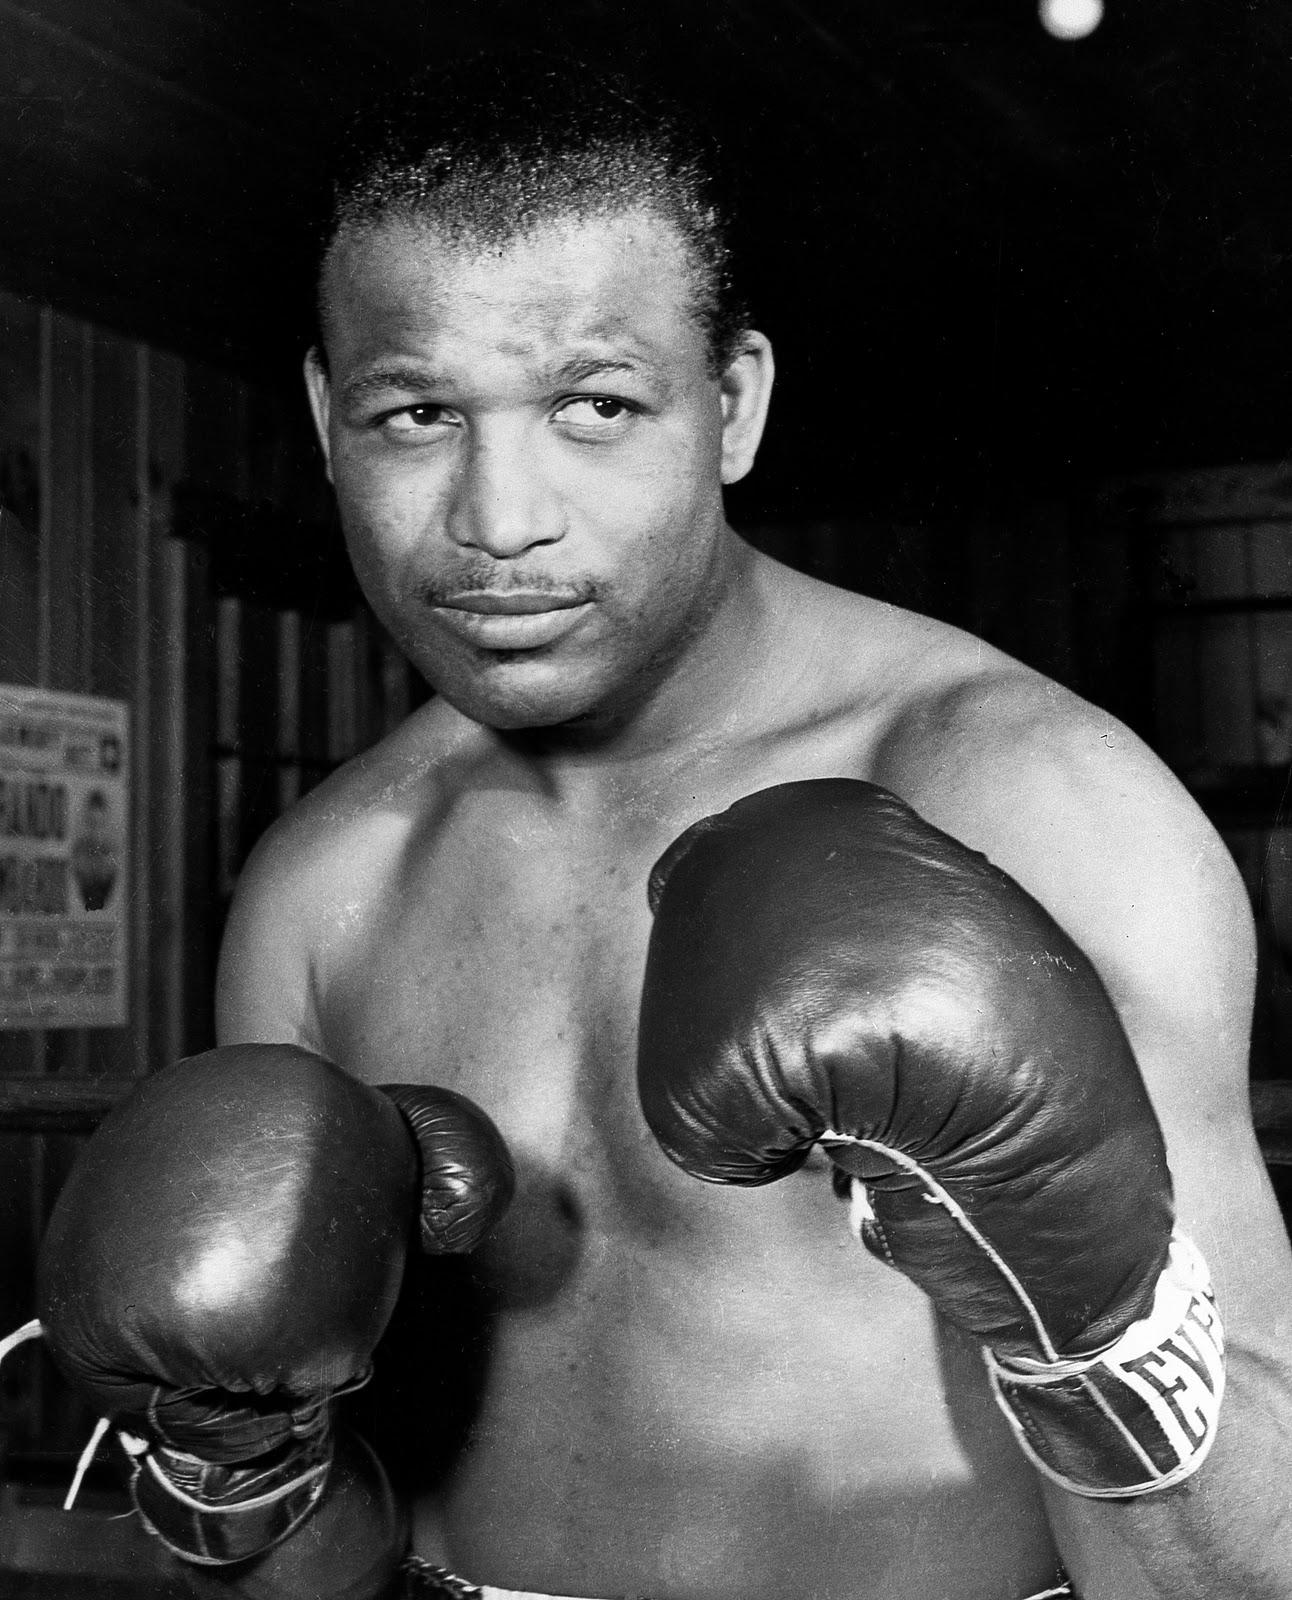 Sugar Ray Robinson, 1921-1989